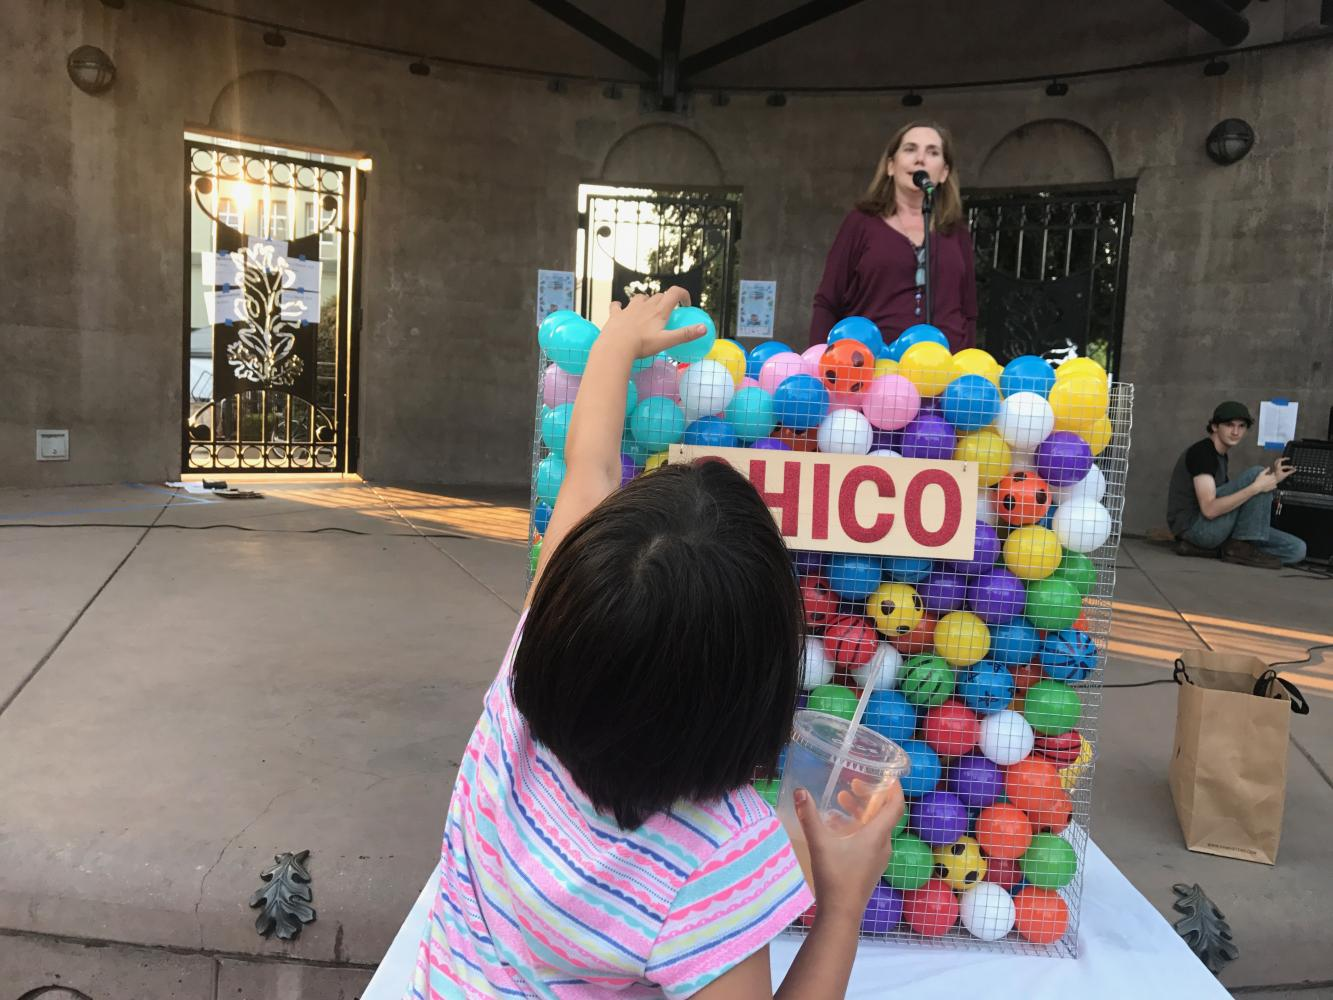 The Chico community unites with a common goal; Depolarizing Chico